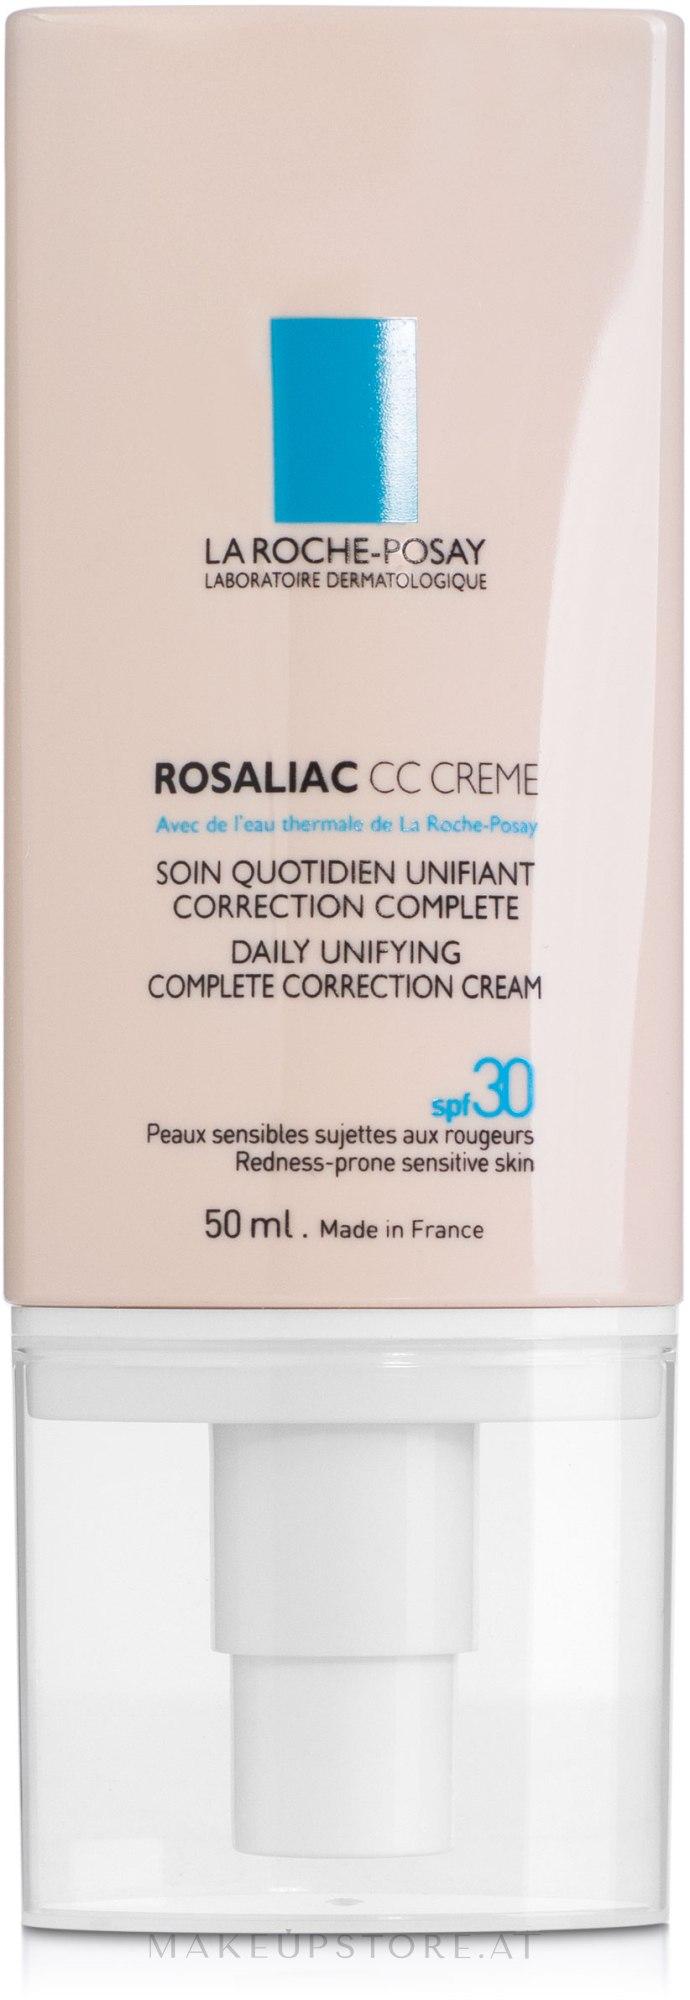 CC Creme gegen Hautrötungen LSF 30 - La Roche-Posay Rosaliac CC Cream SPF 30 — Bild 50 ml